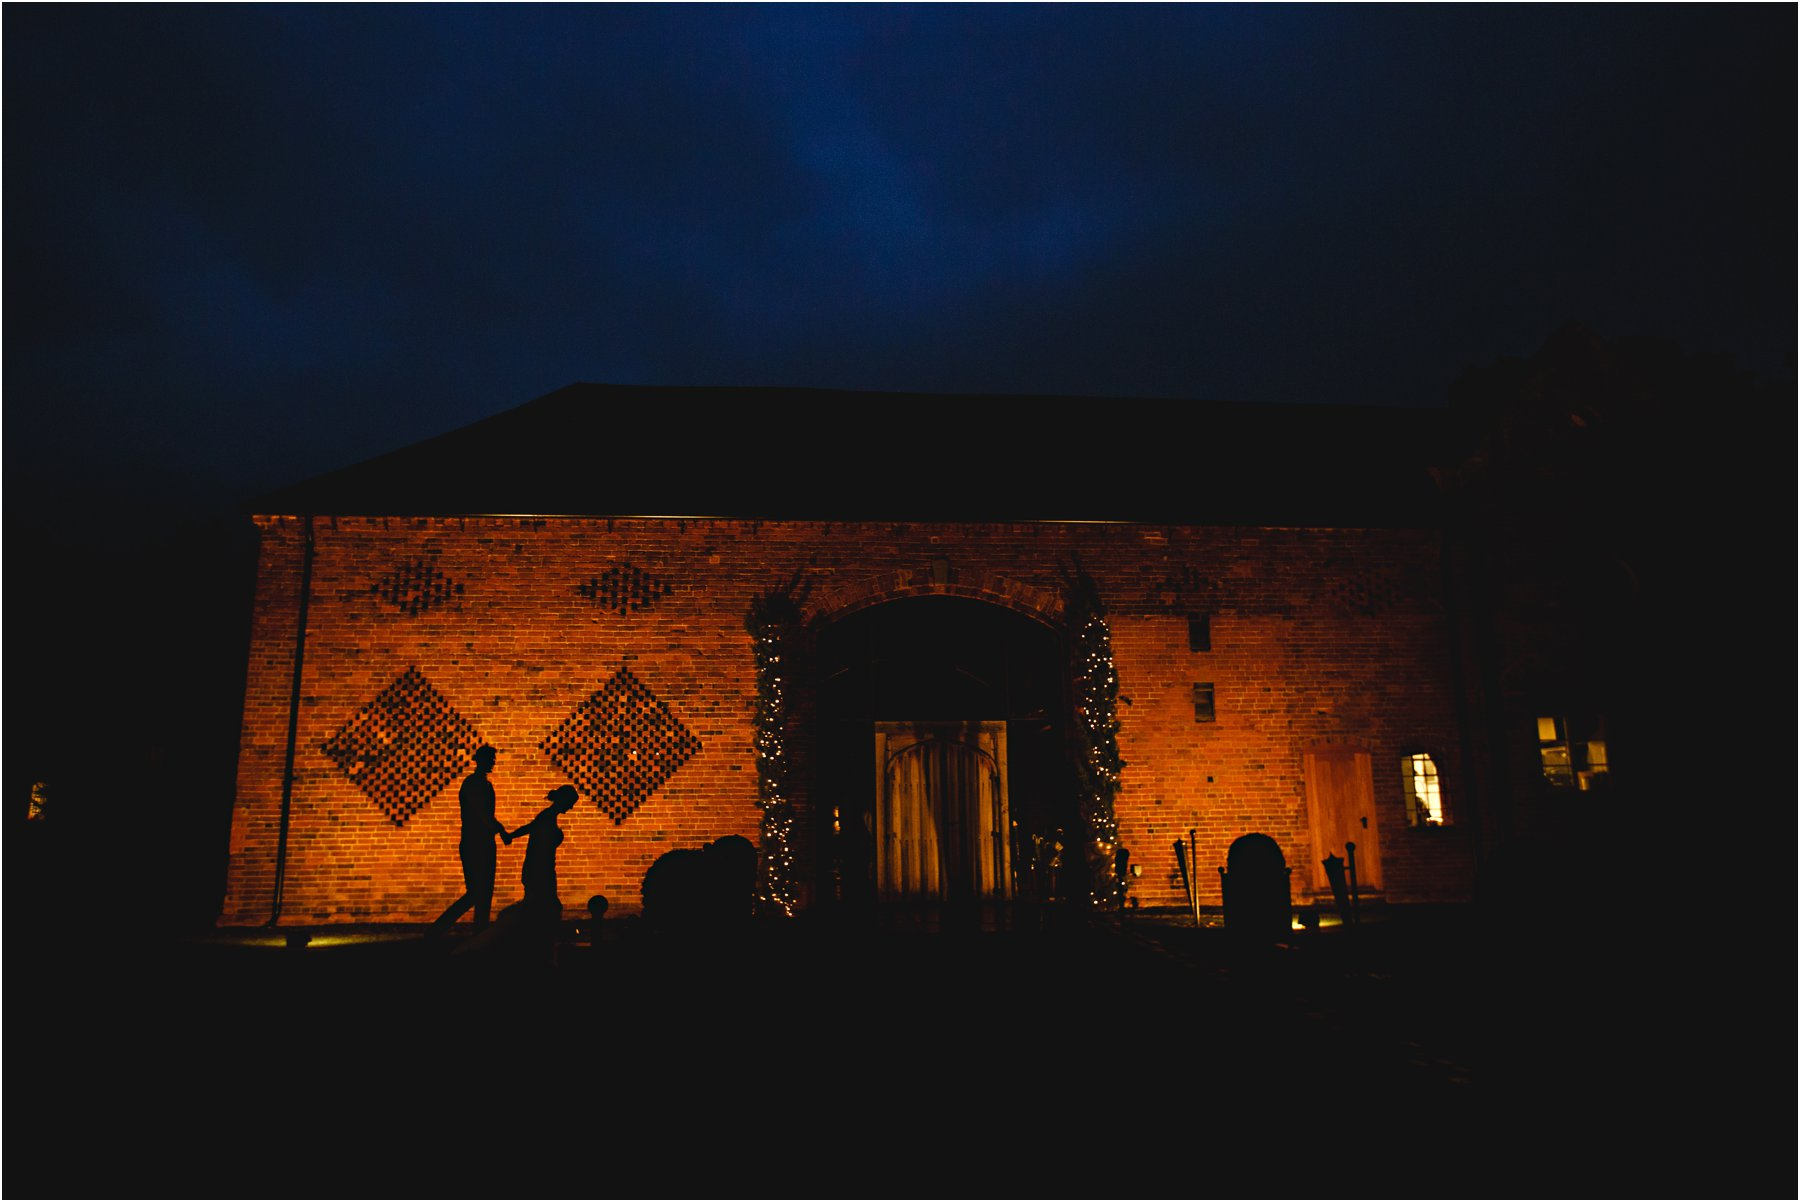 The bride & groom walking in silhouette at Shustoke Farm barn